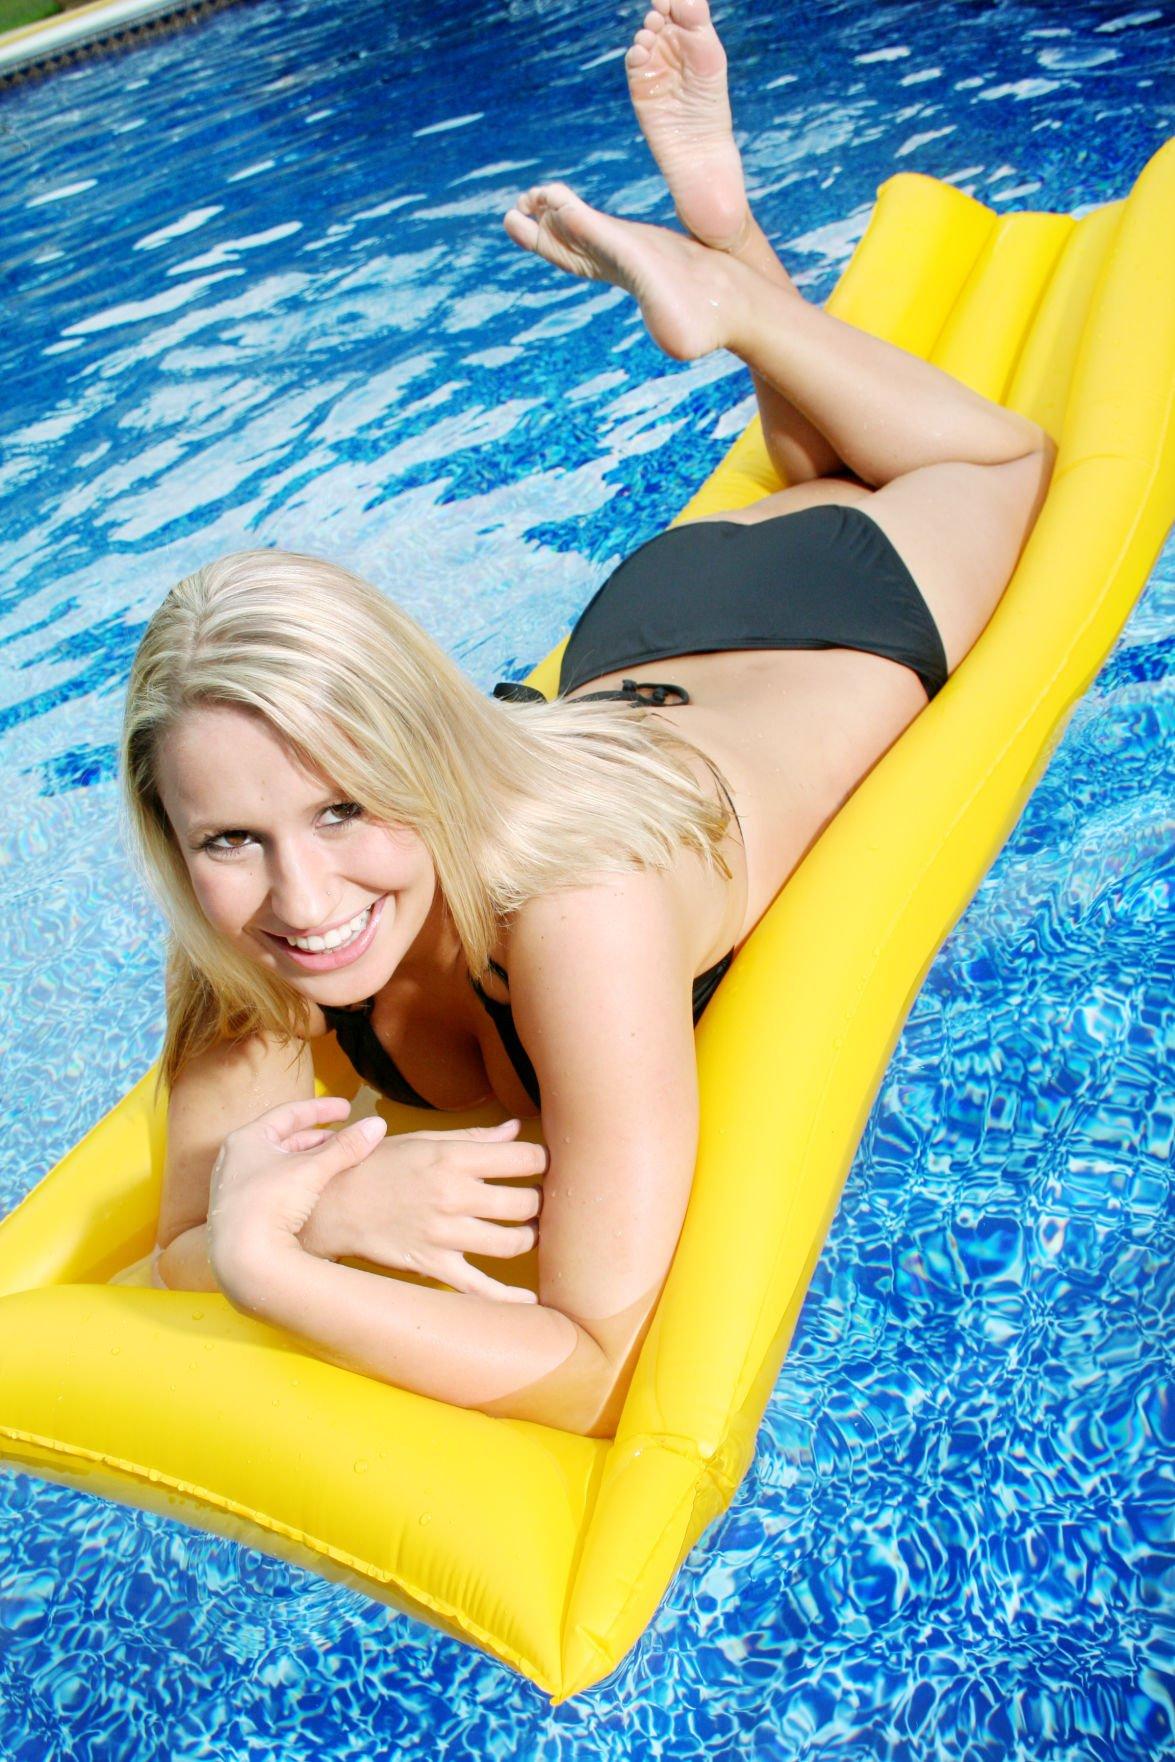 Female sunbather